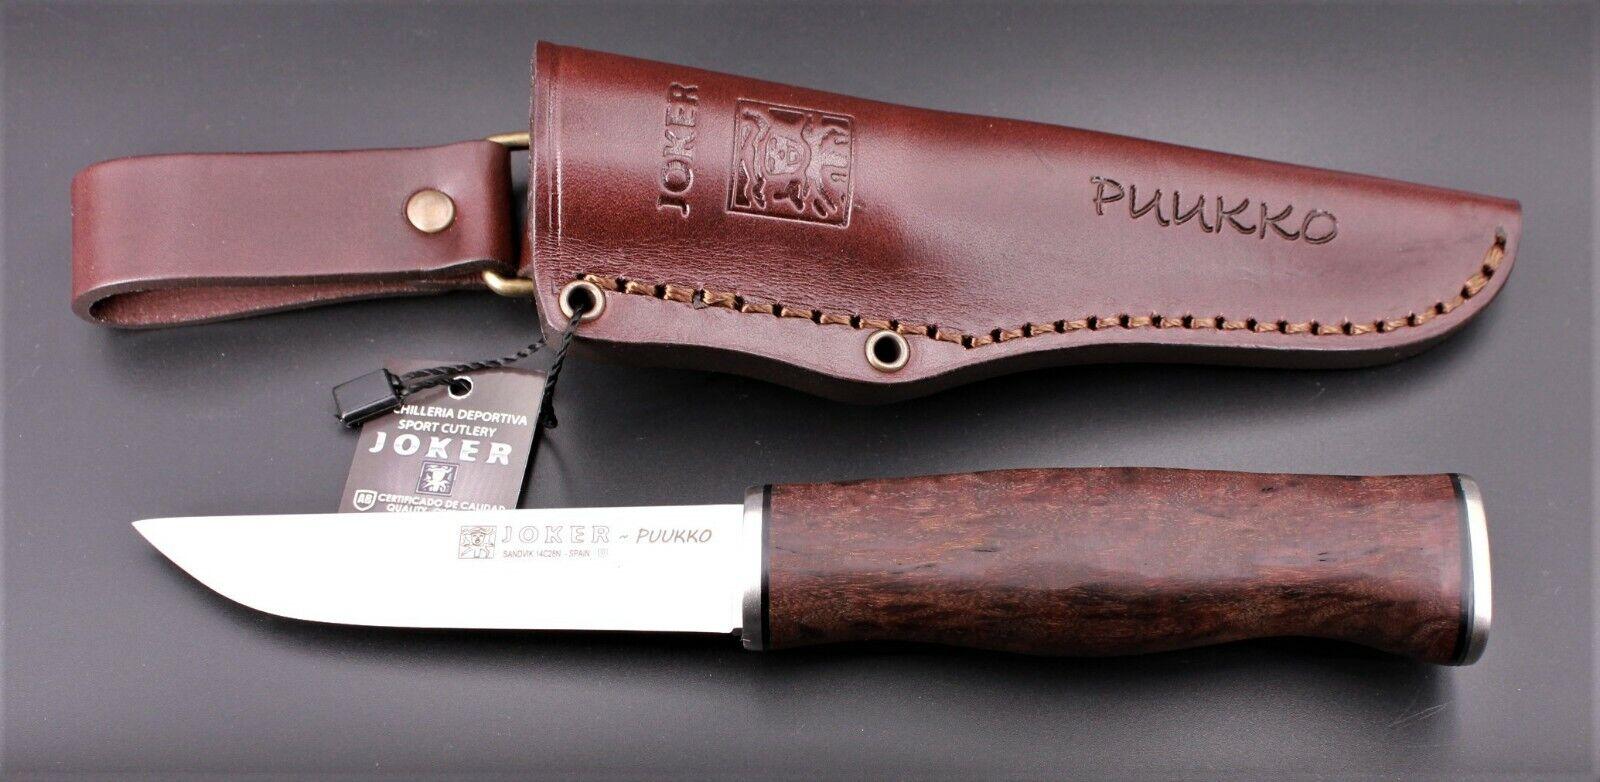 JOKER Puukko CL130 Maserbirke gebeizt Lederscheide Messer Jagdmesser